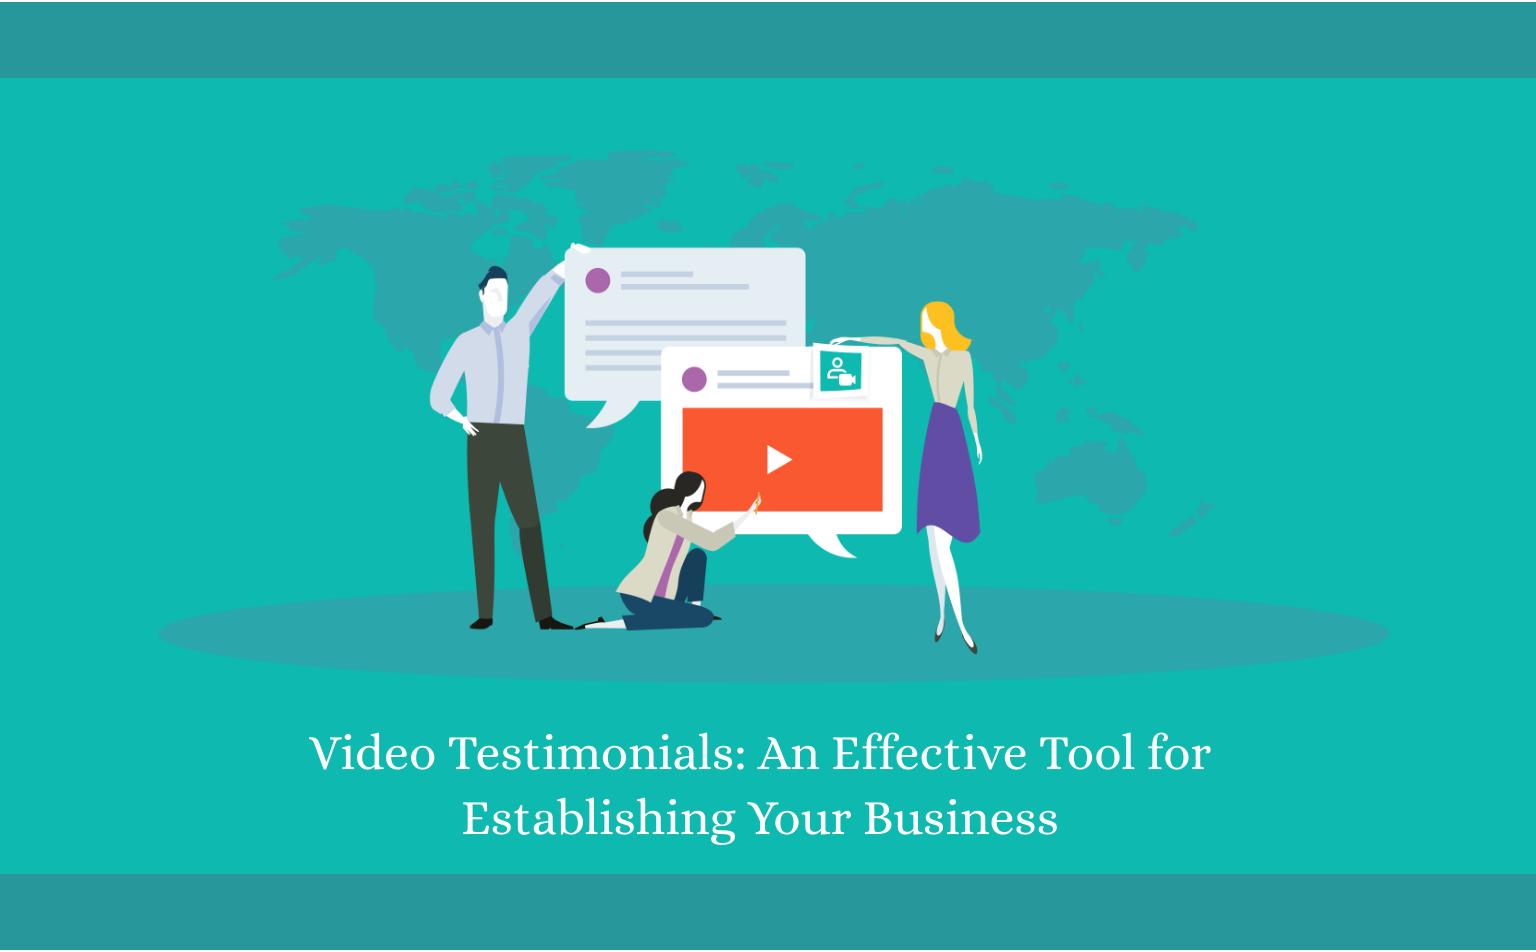 Video Testimonials- An Effective Tool for Establishing YourBusiness